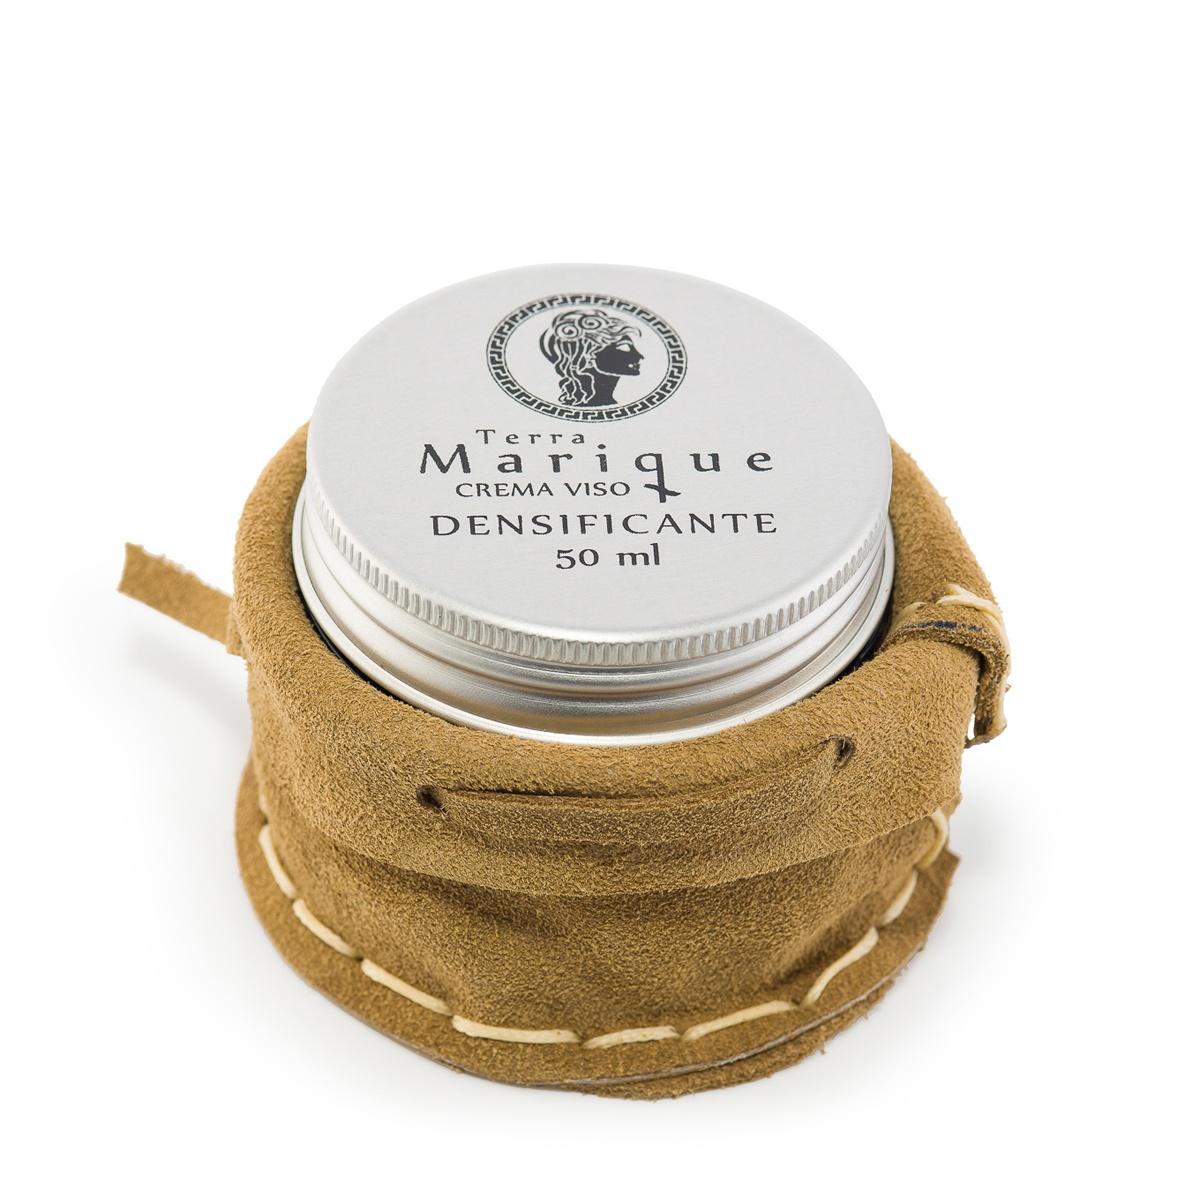 Terre Marique firming face cream